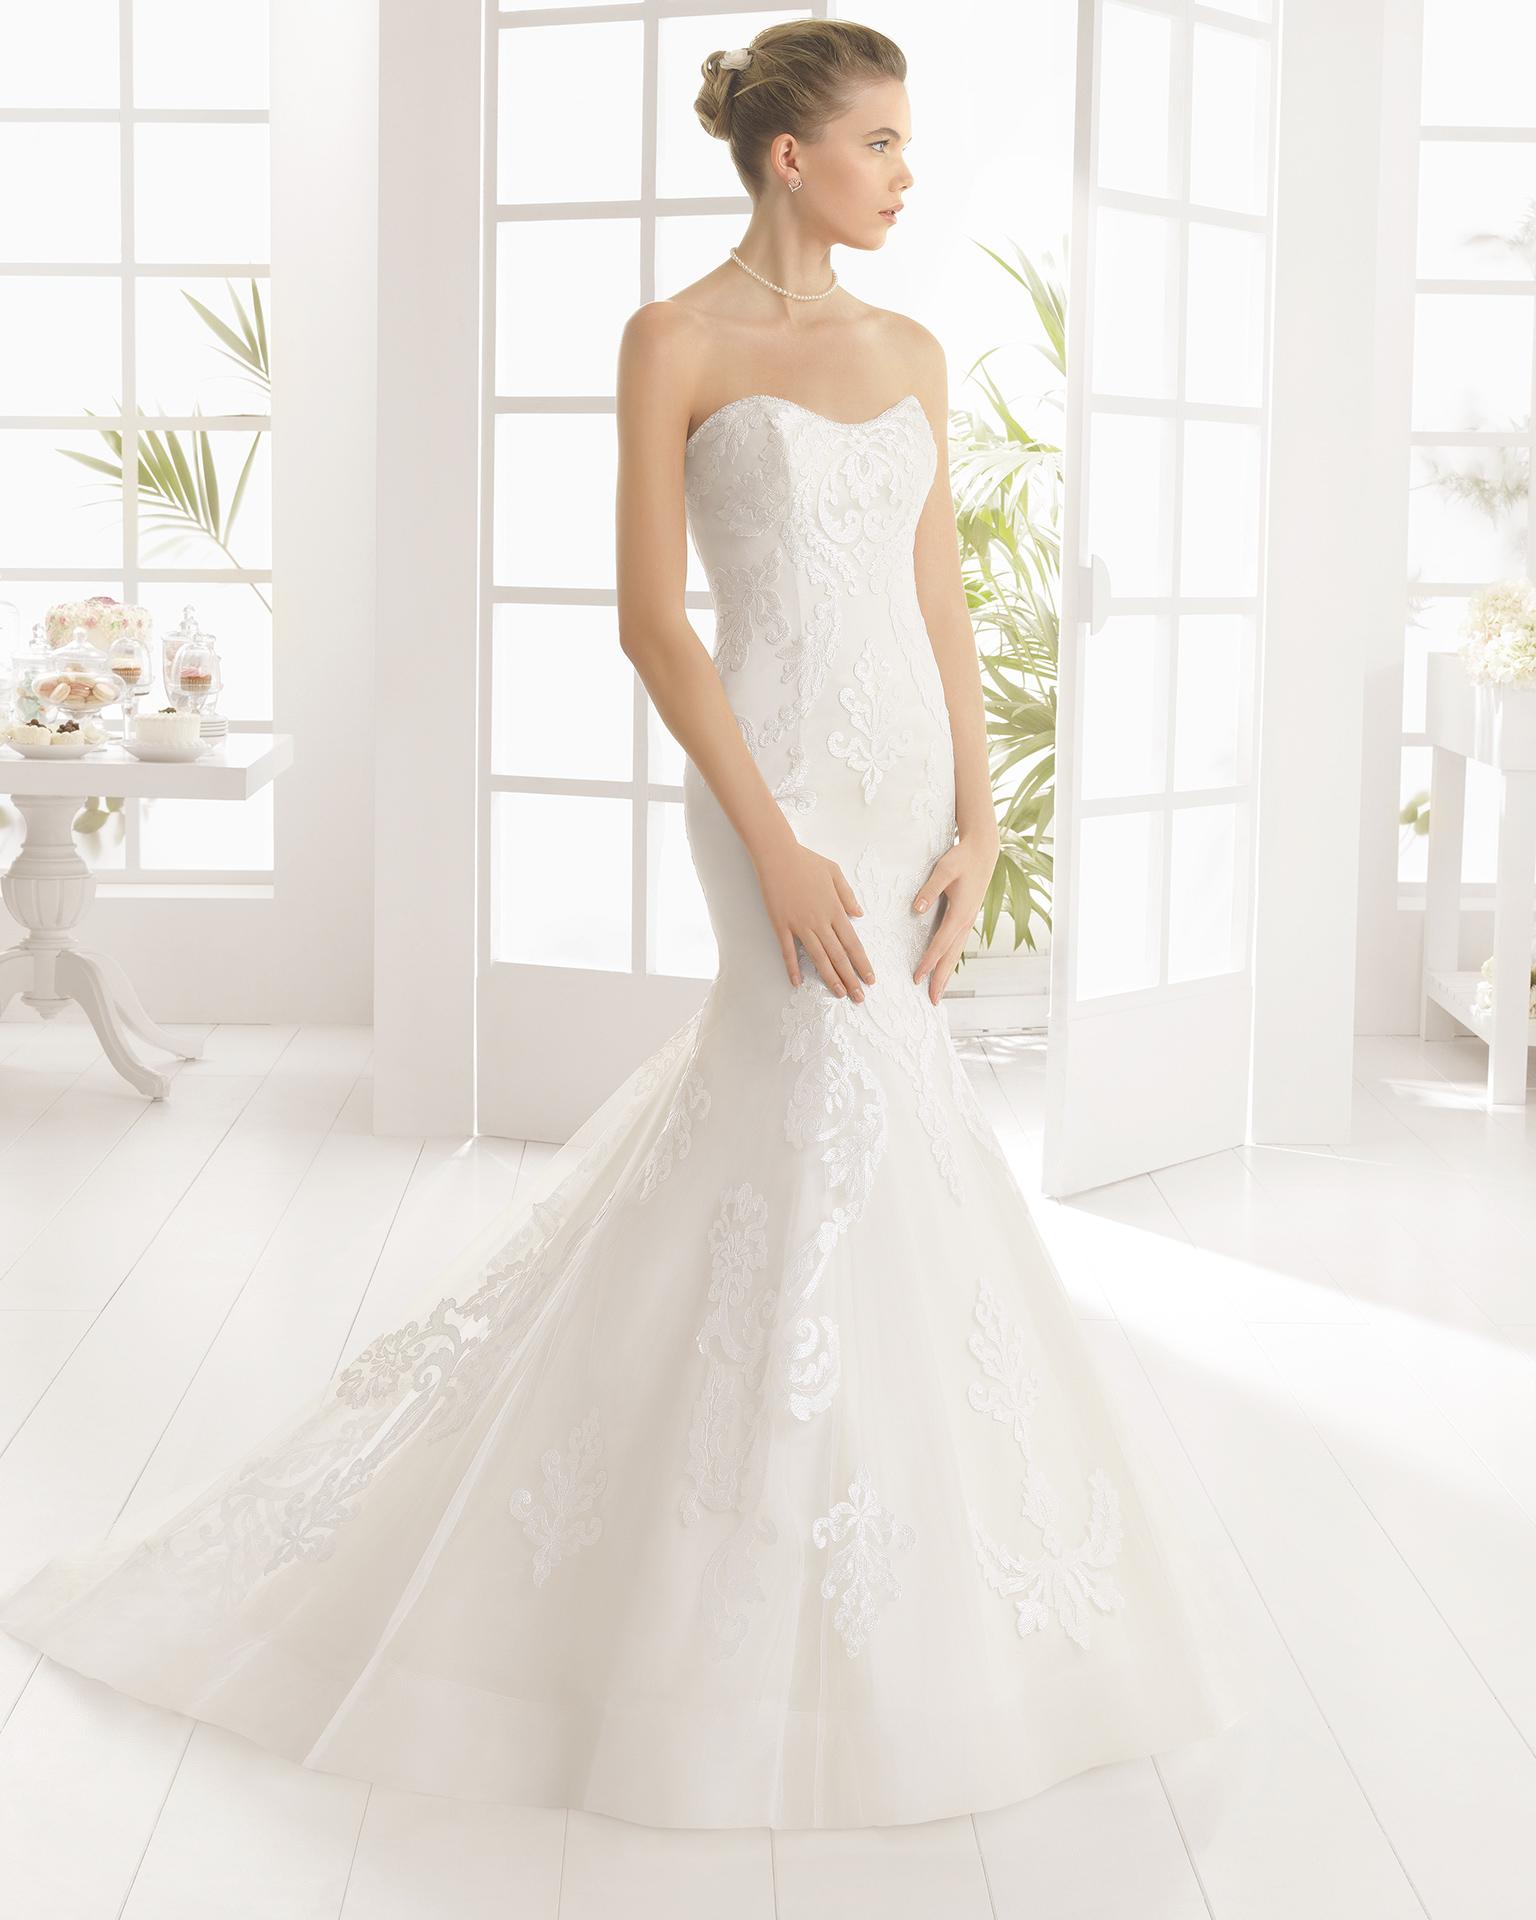 MARYS beaded lace wedding dress.